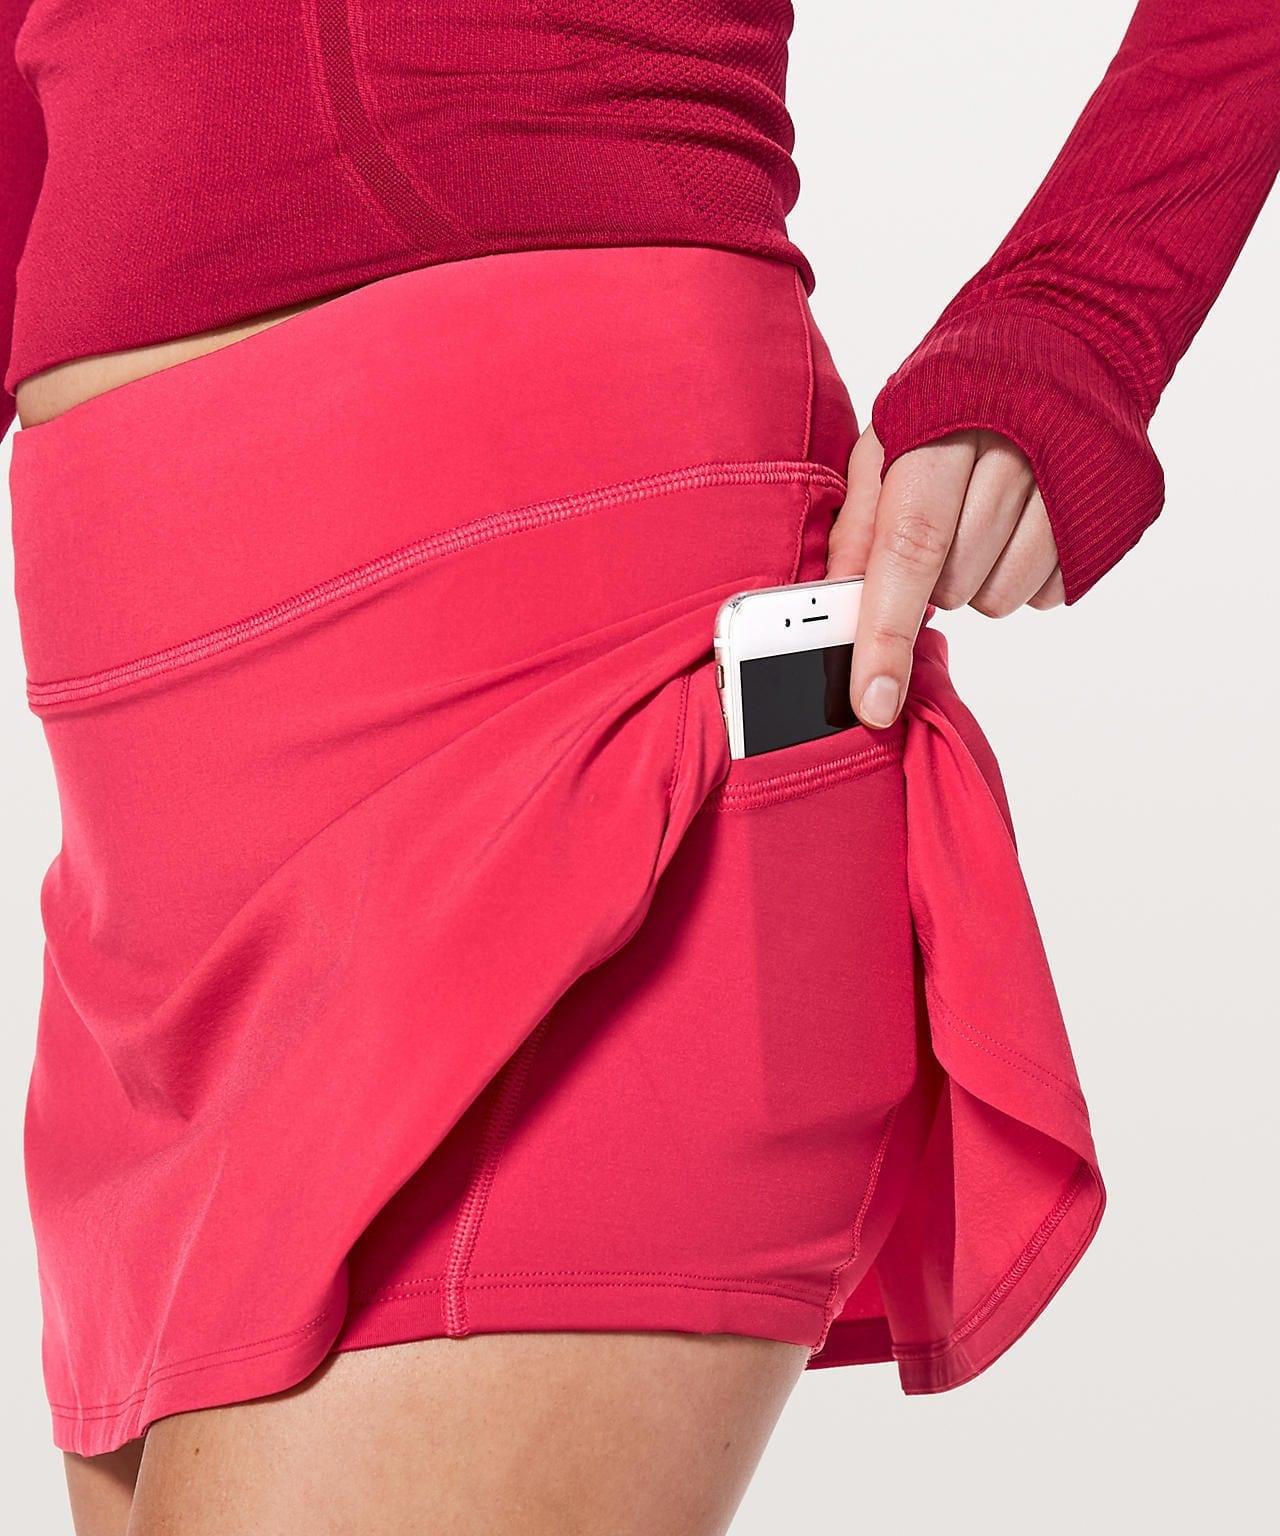 Play Off The Pleats Skirt - Fuchsia Pink